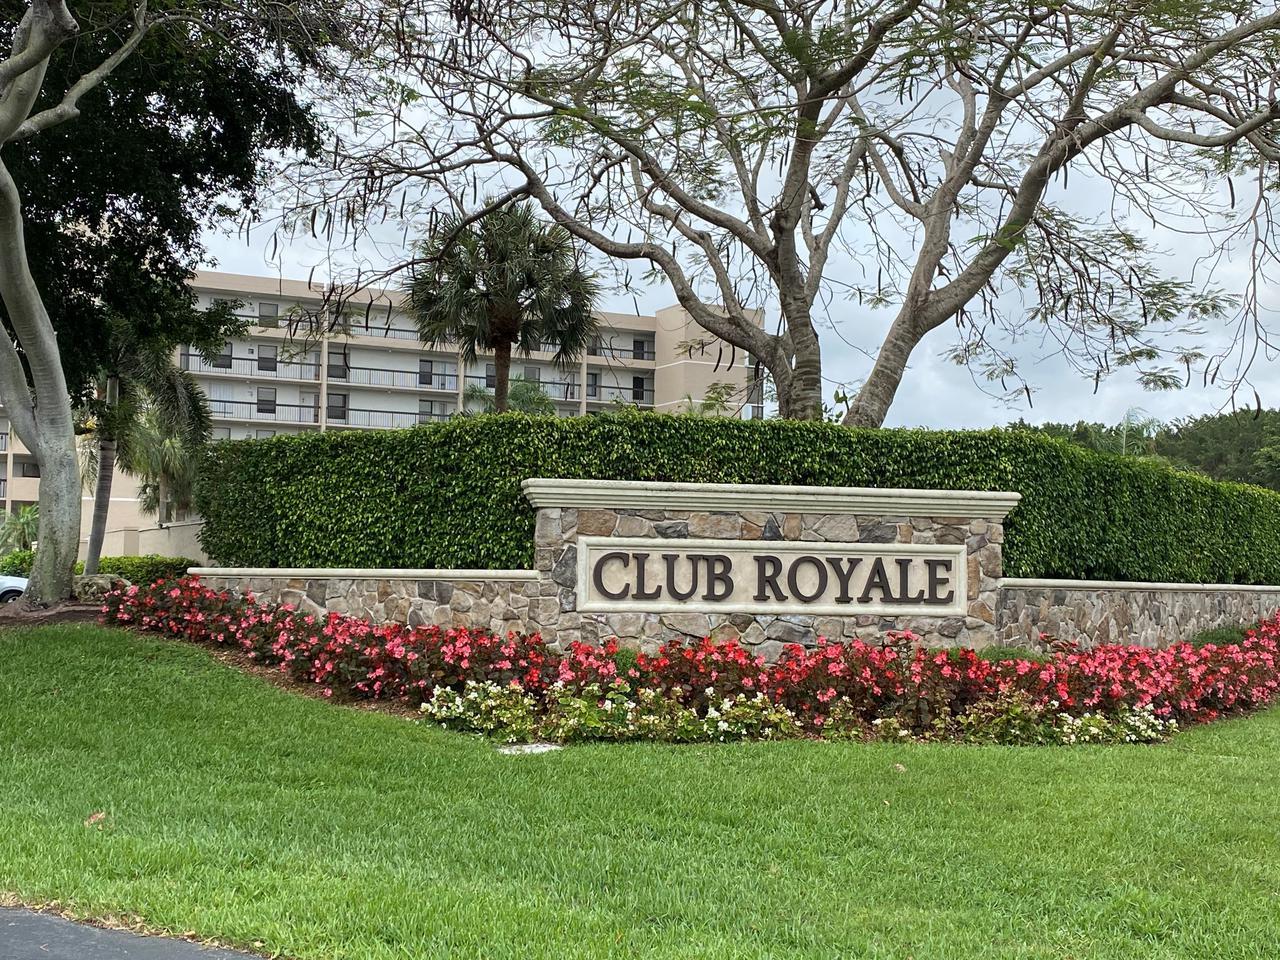 club royale.jpg